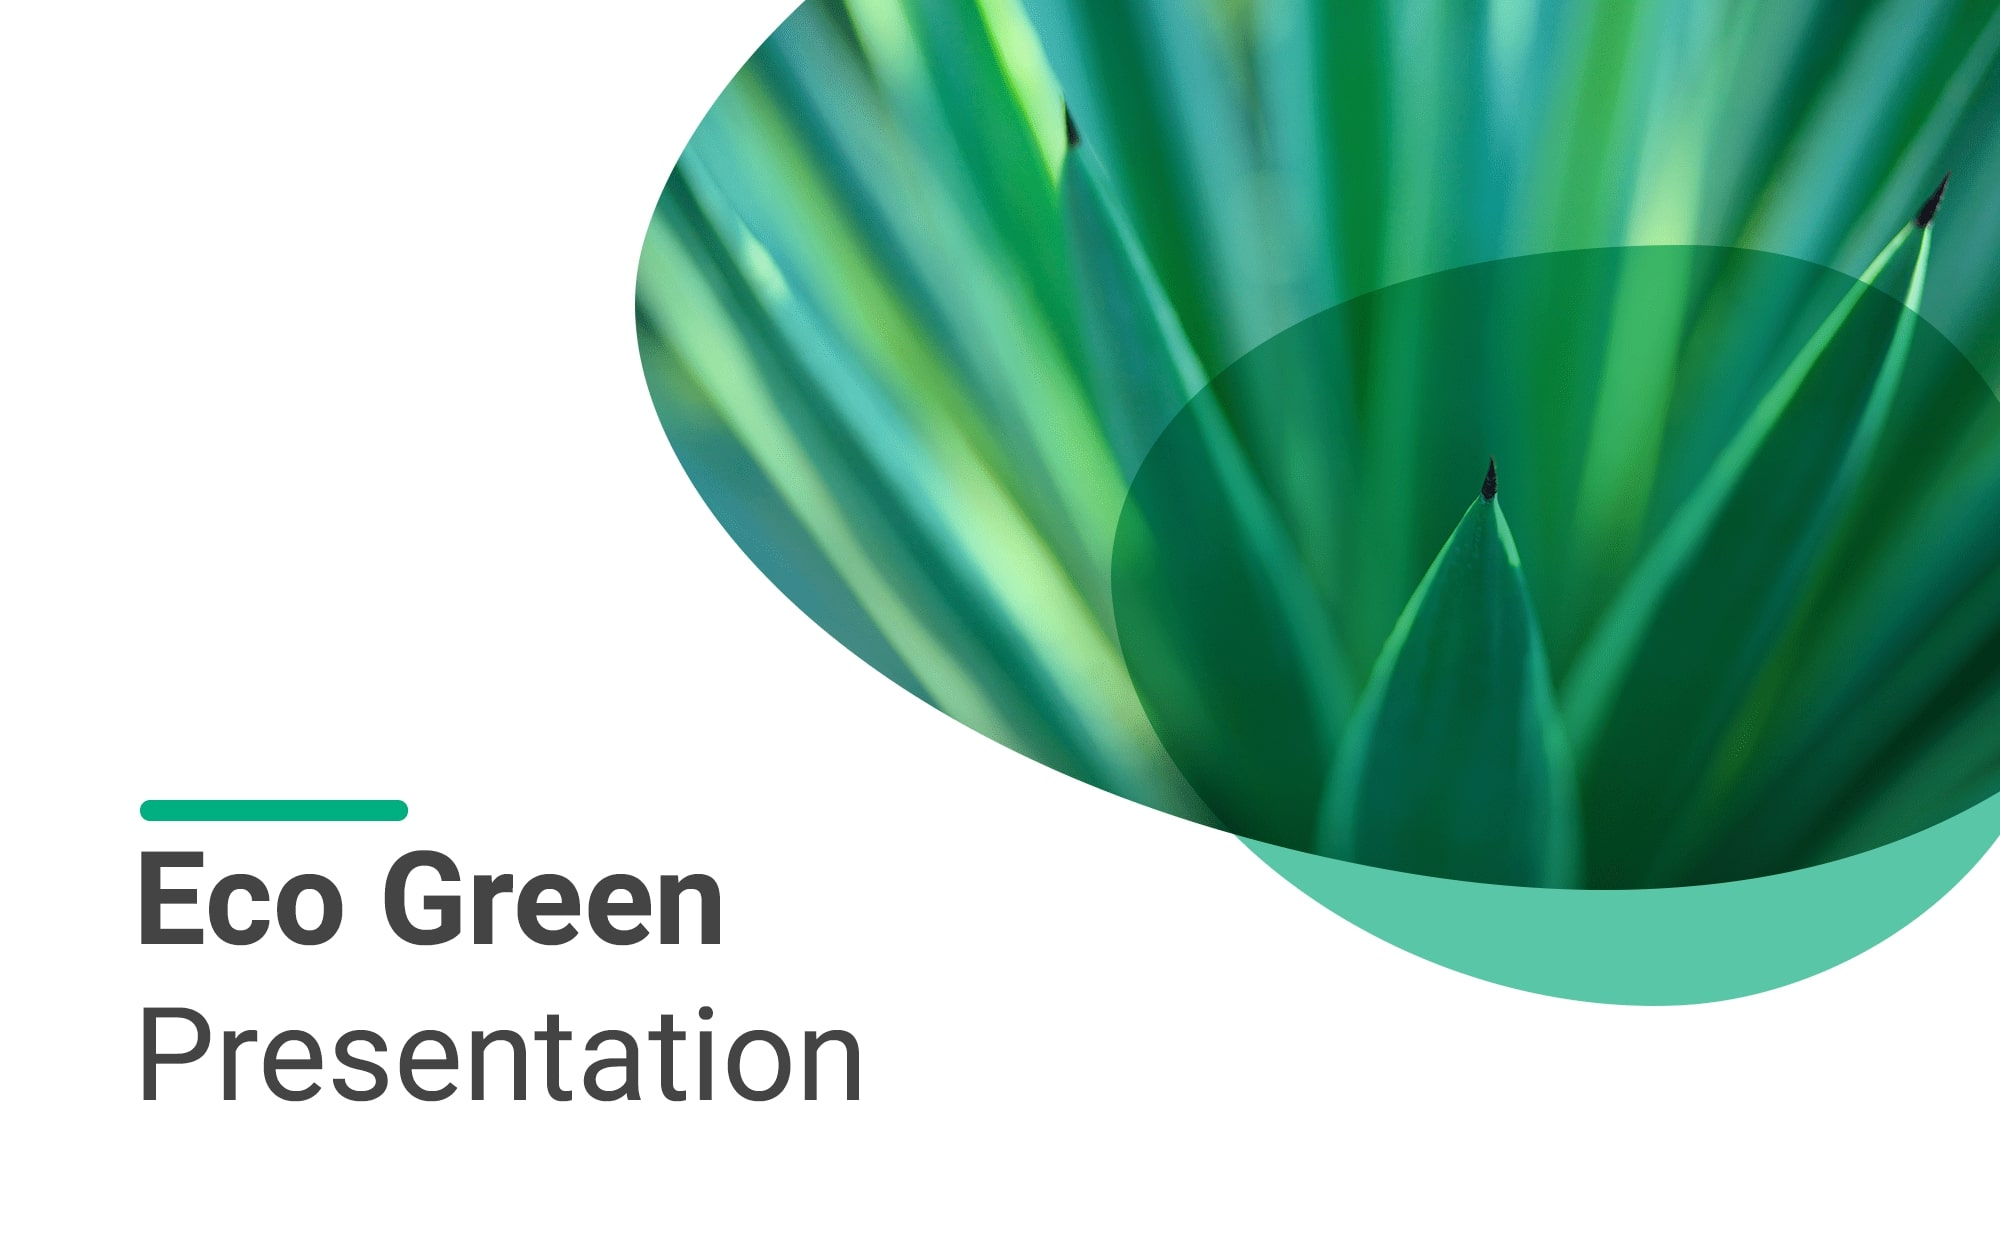 Plantilla de presentación ecológica